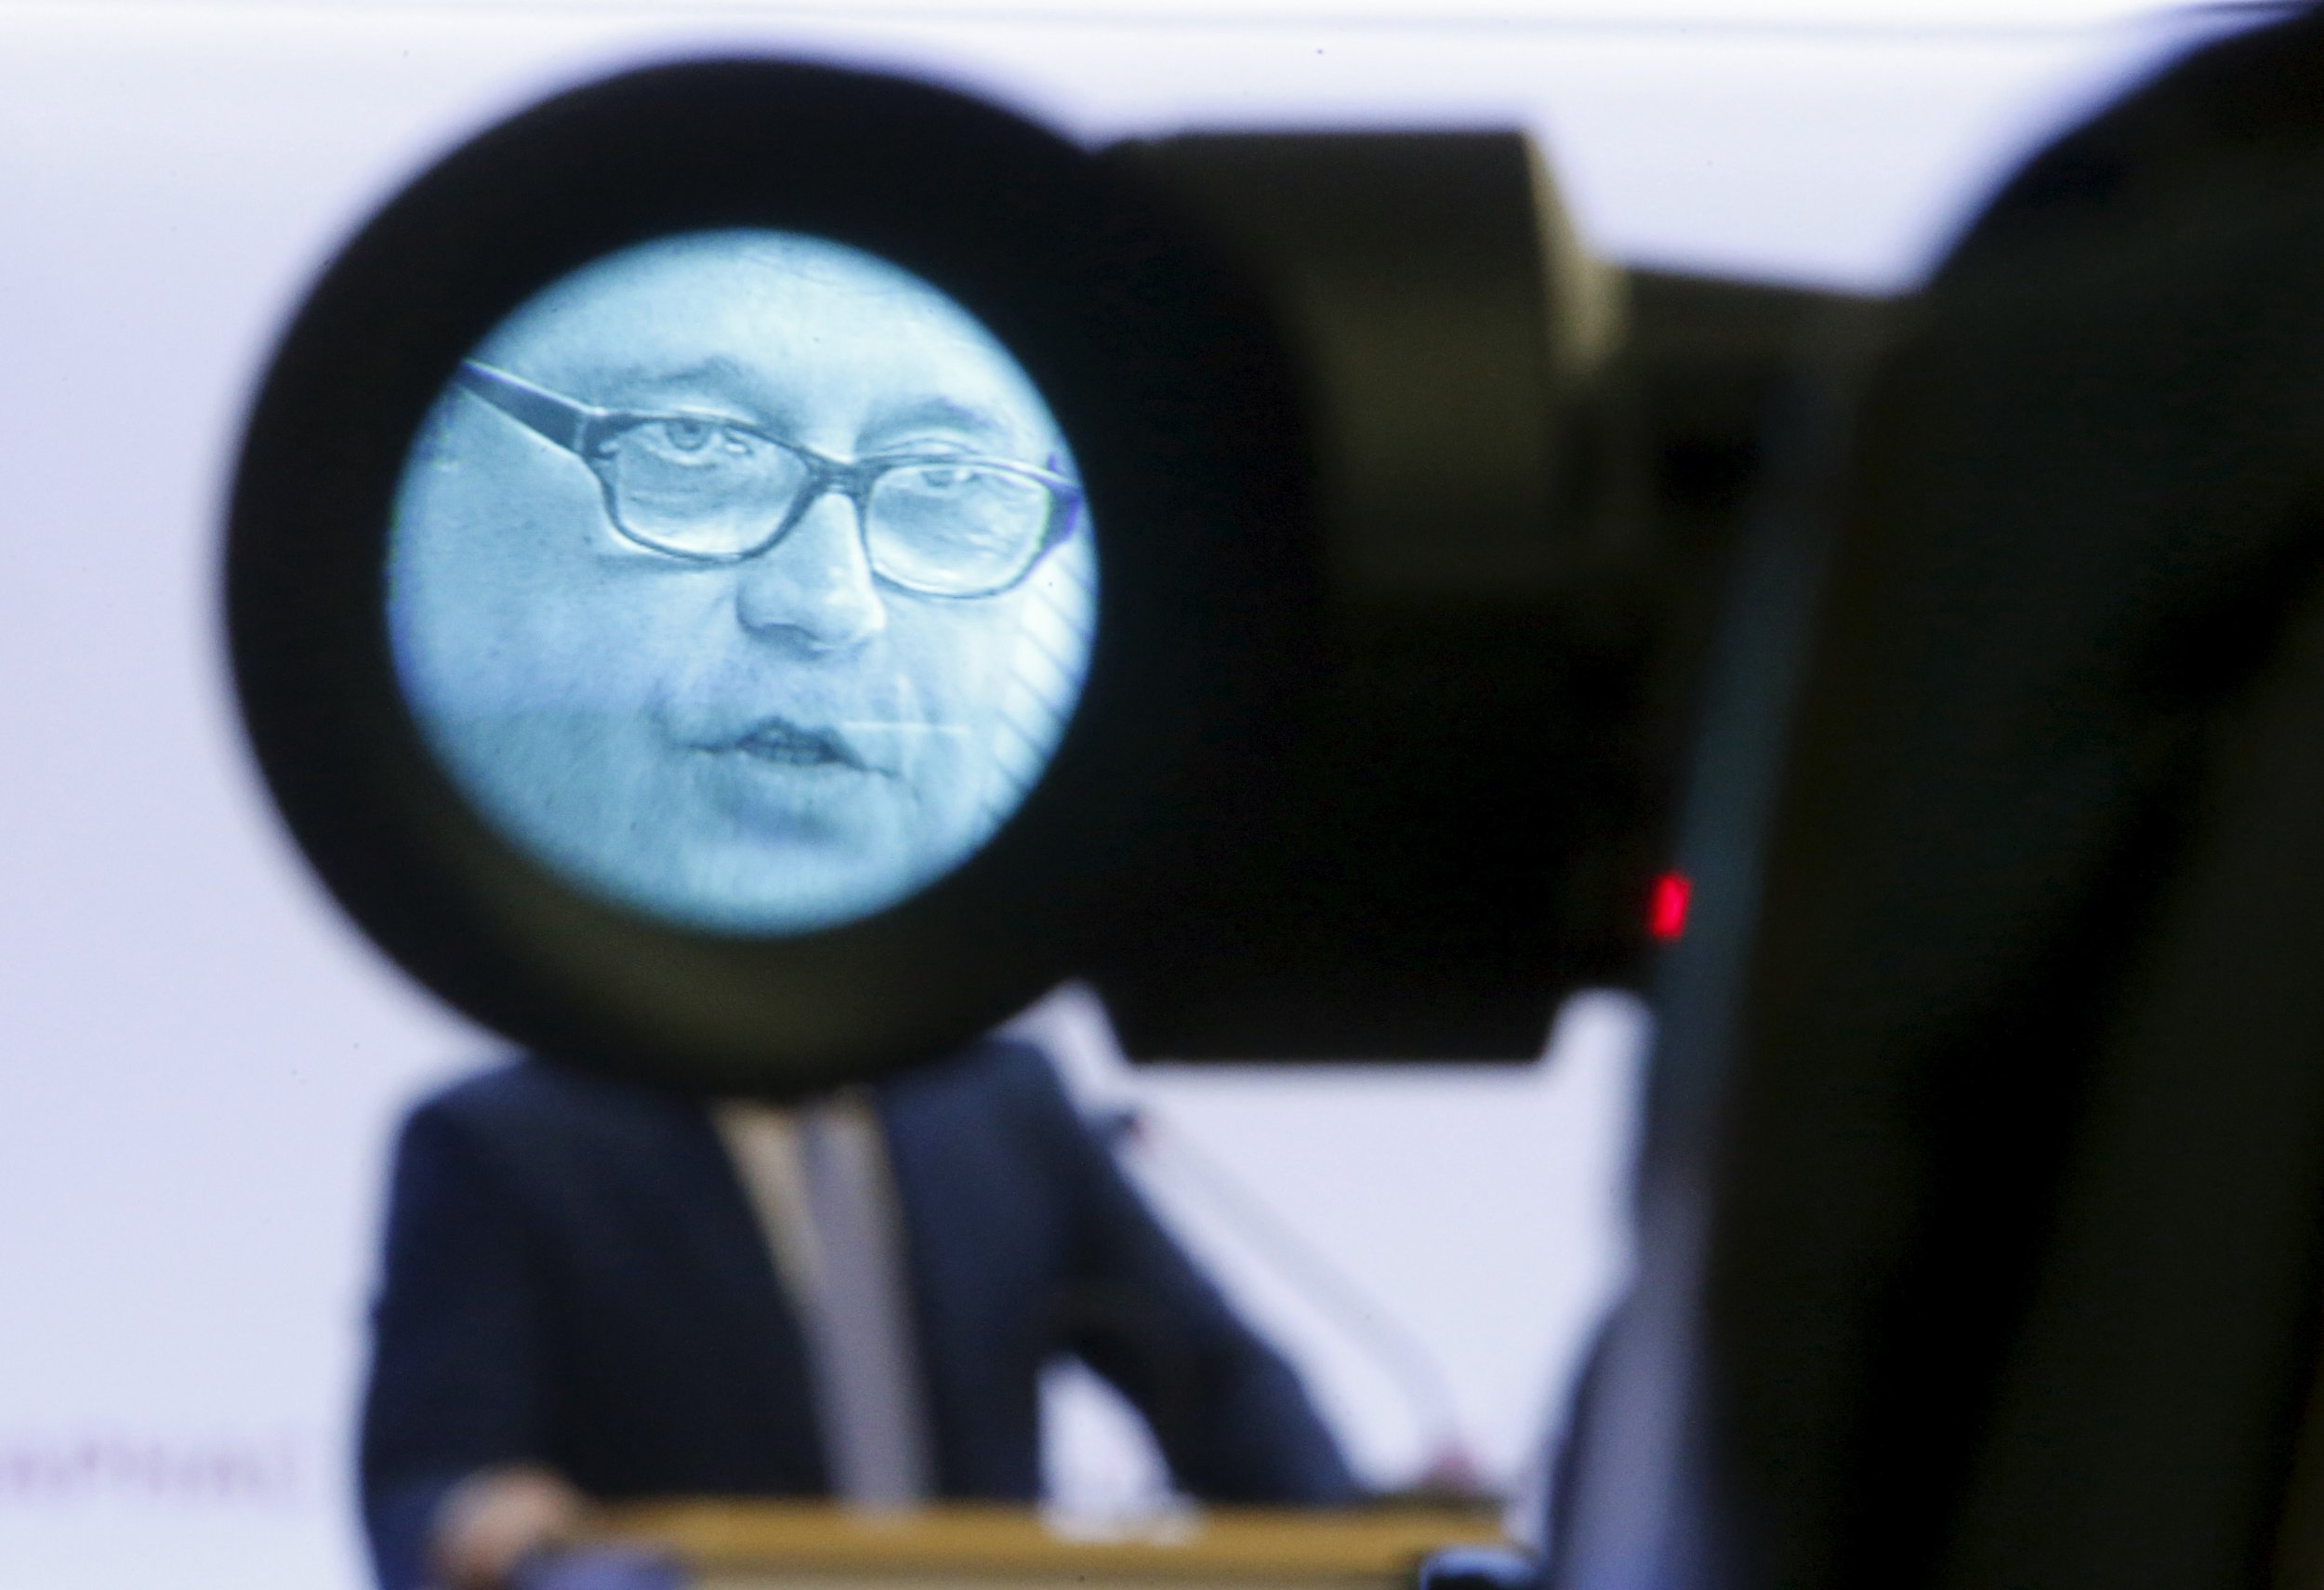 Kasyanov's face seen in a camera close up